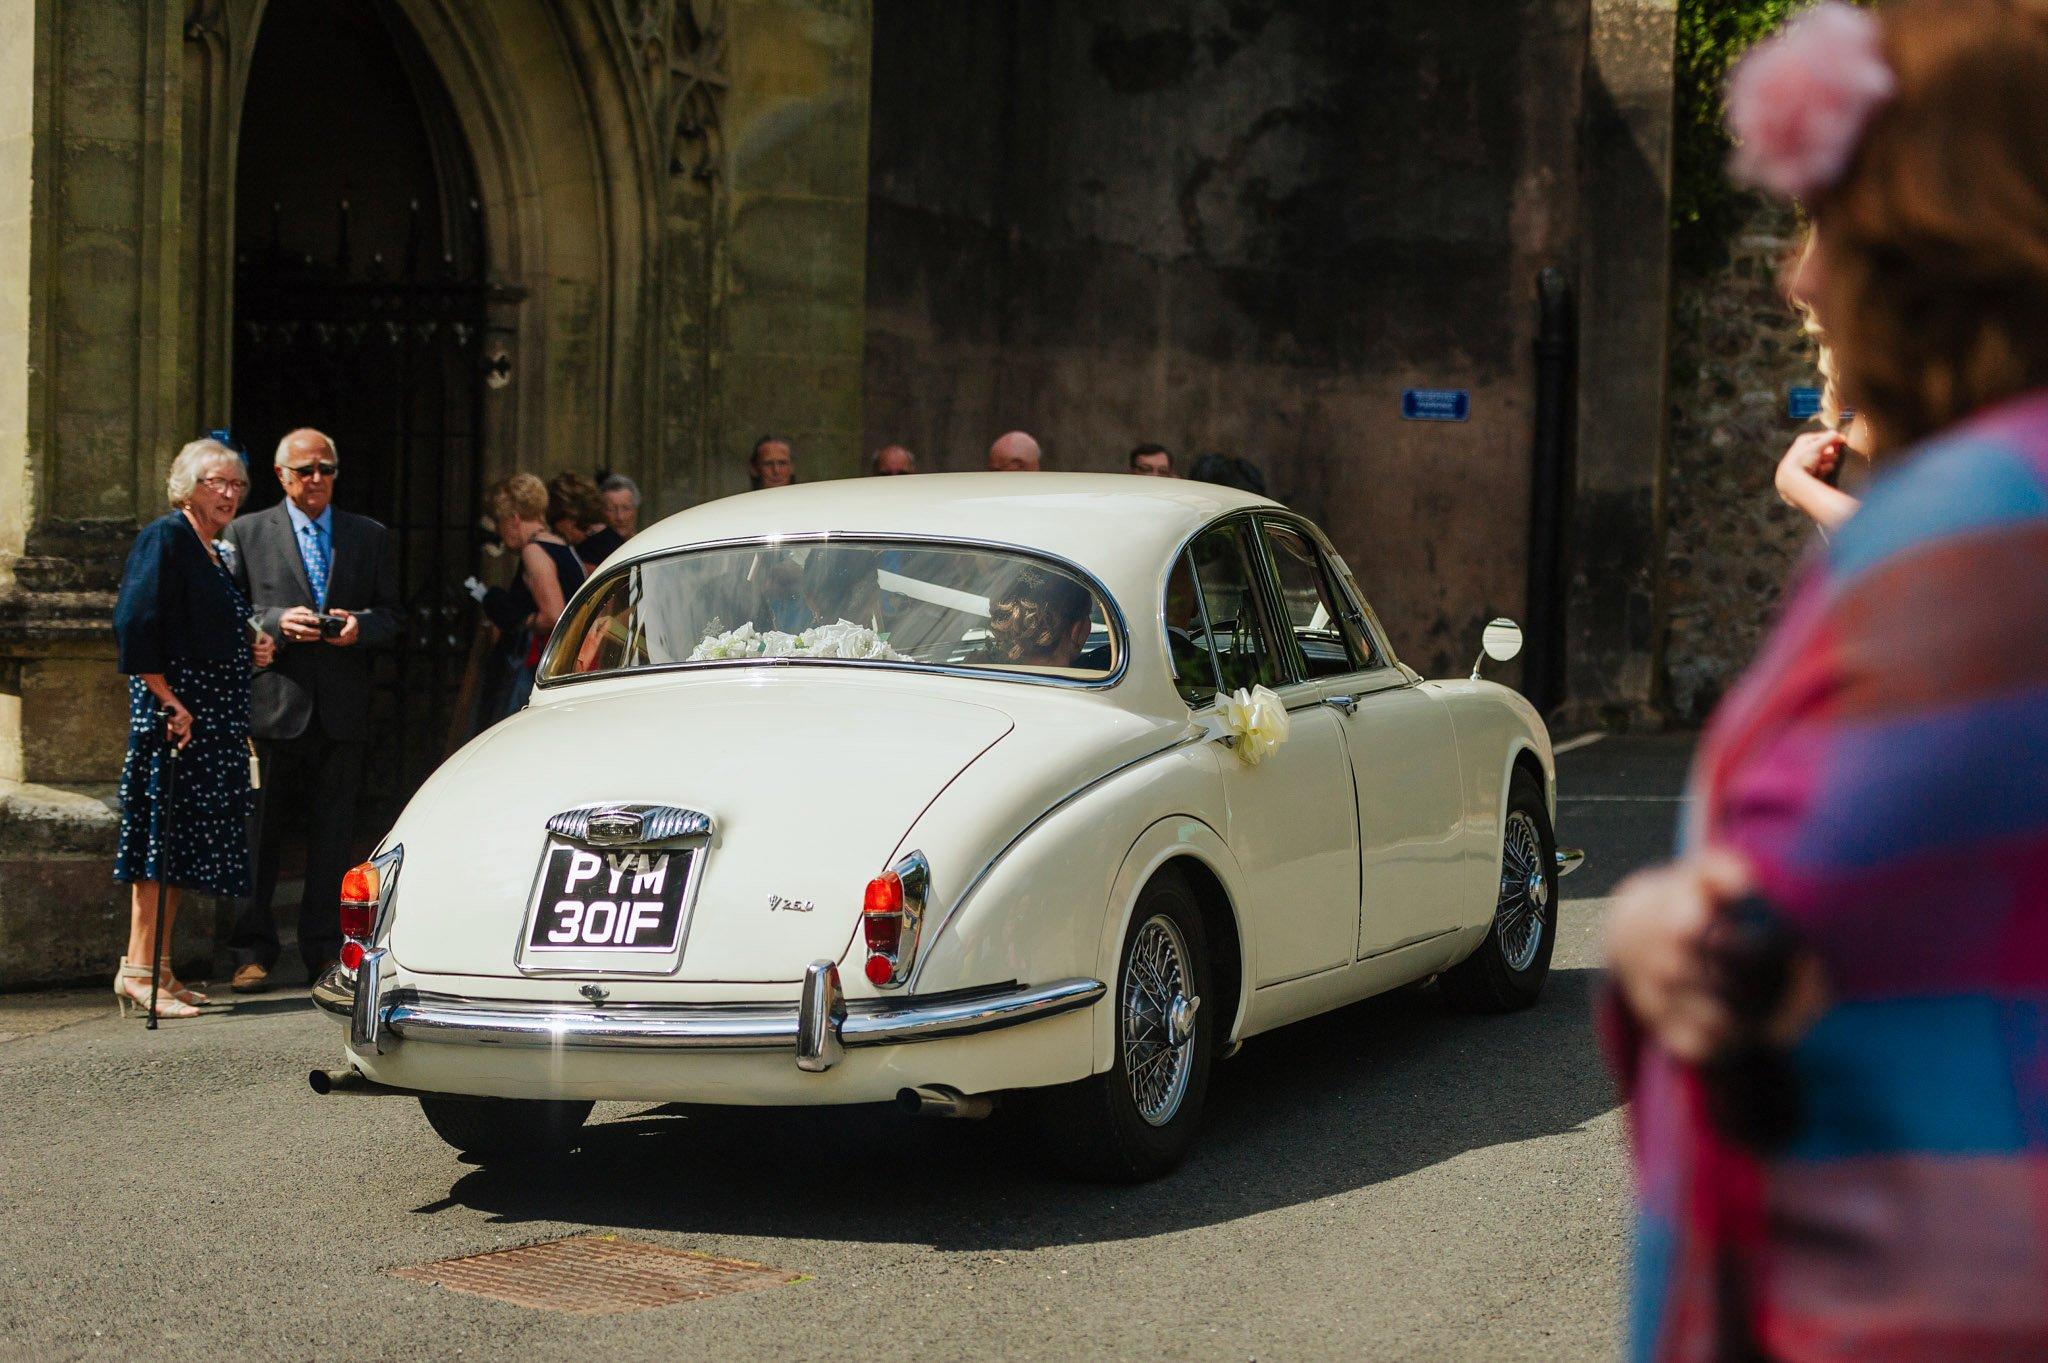 Georgina + Mike - Wedding photography in Malvern, Worcestershire 18